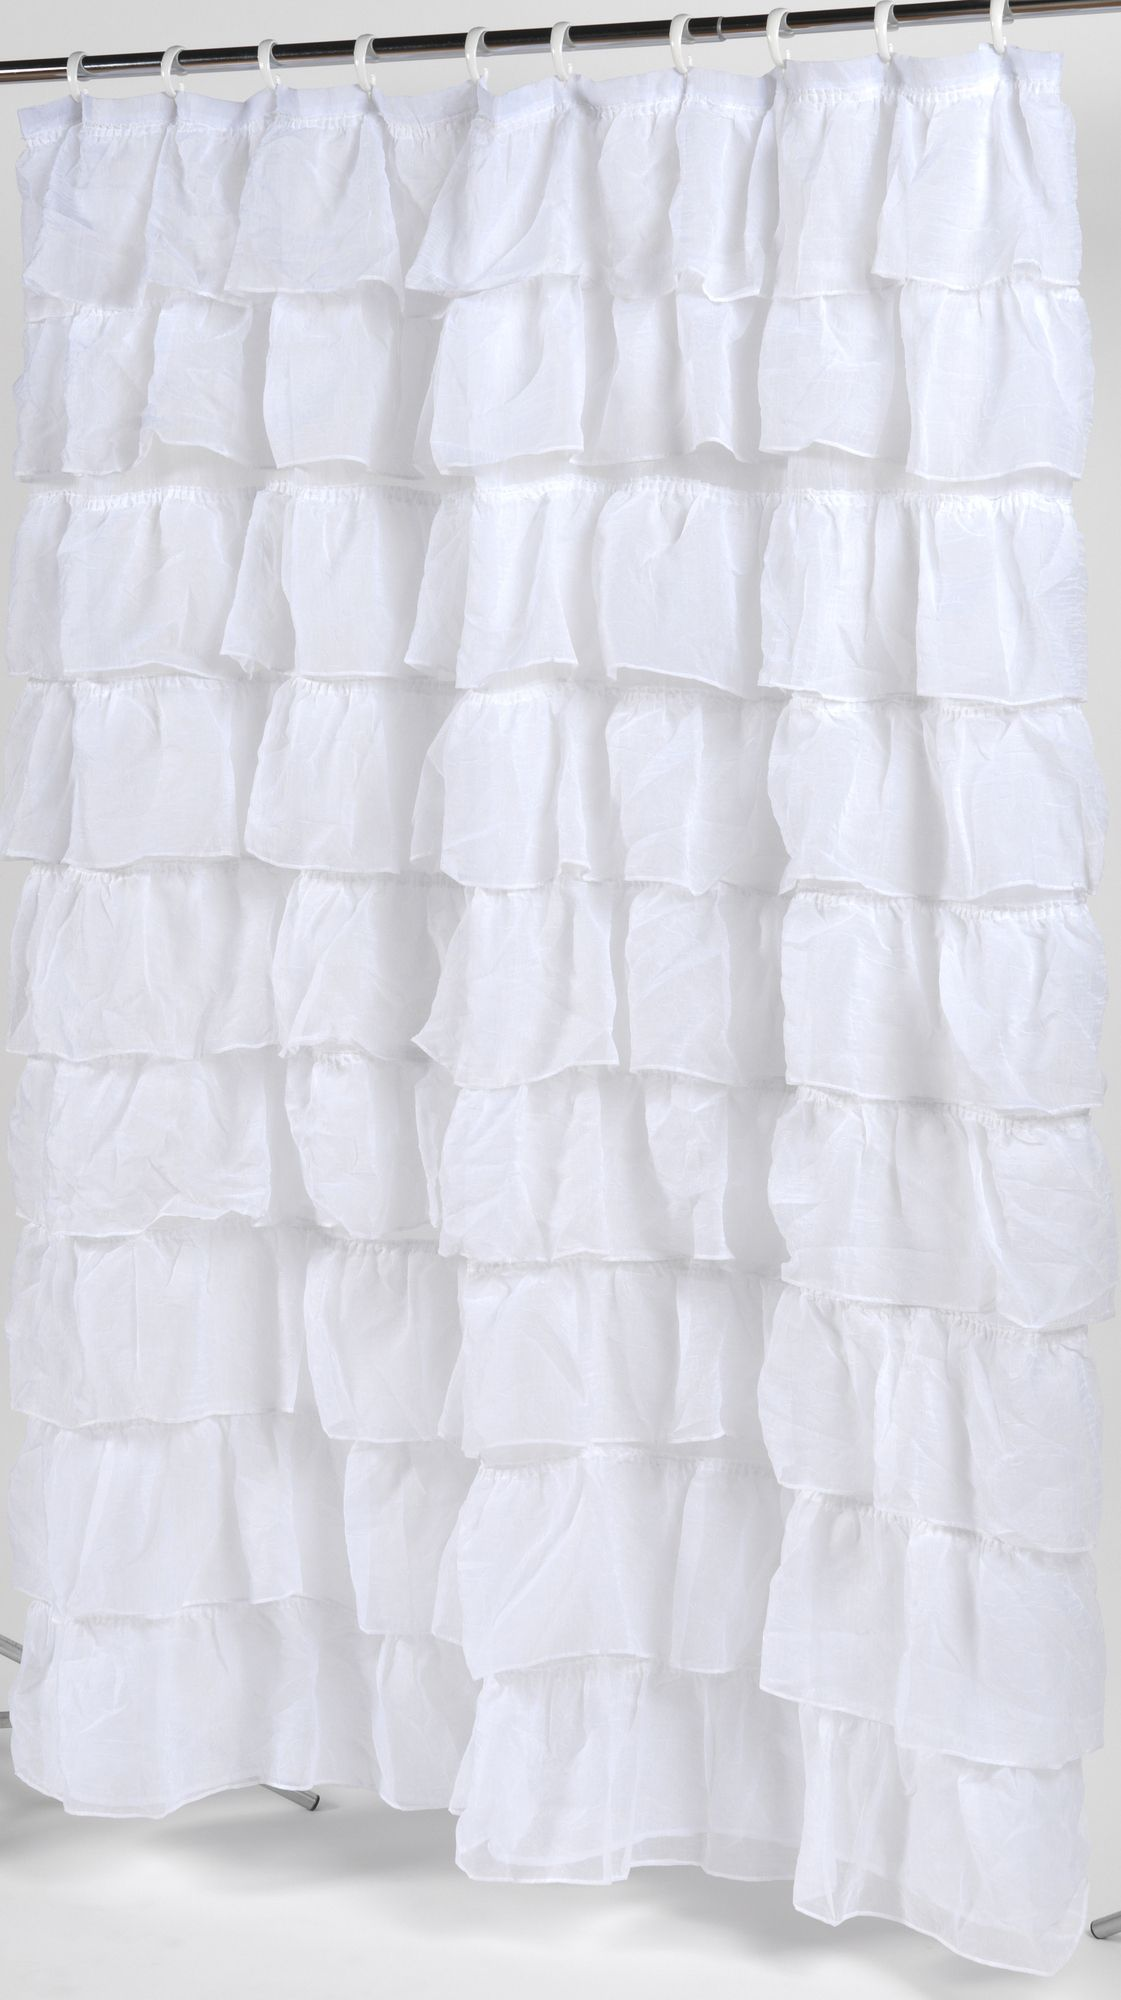 ruffle shower curtain diy home decorideas pinterest